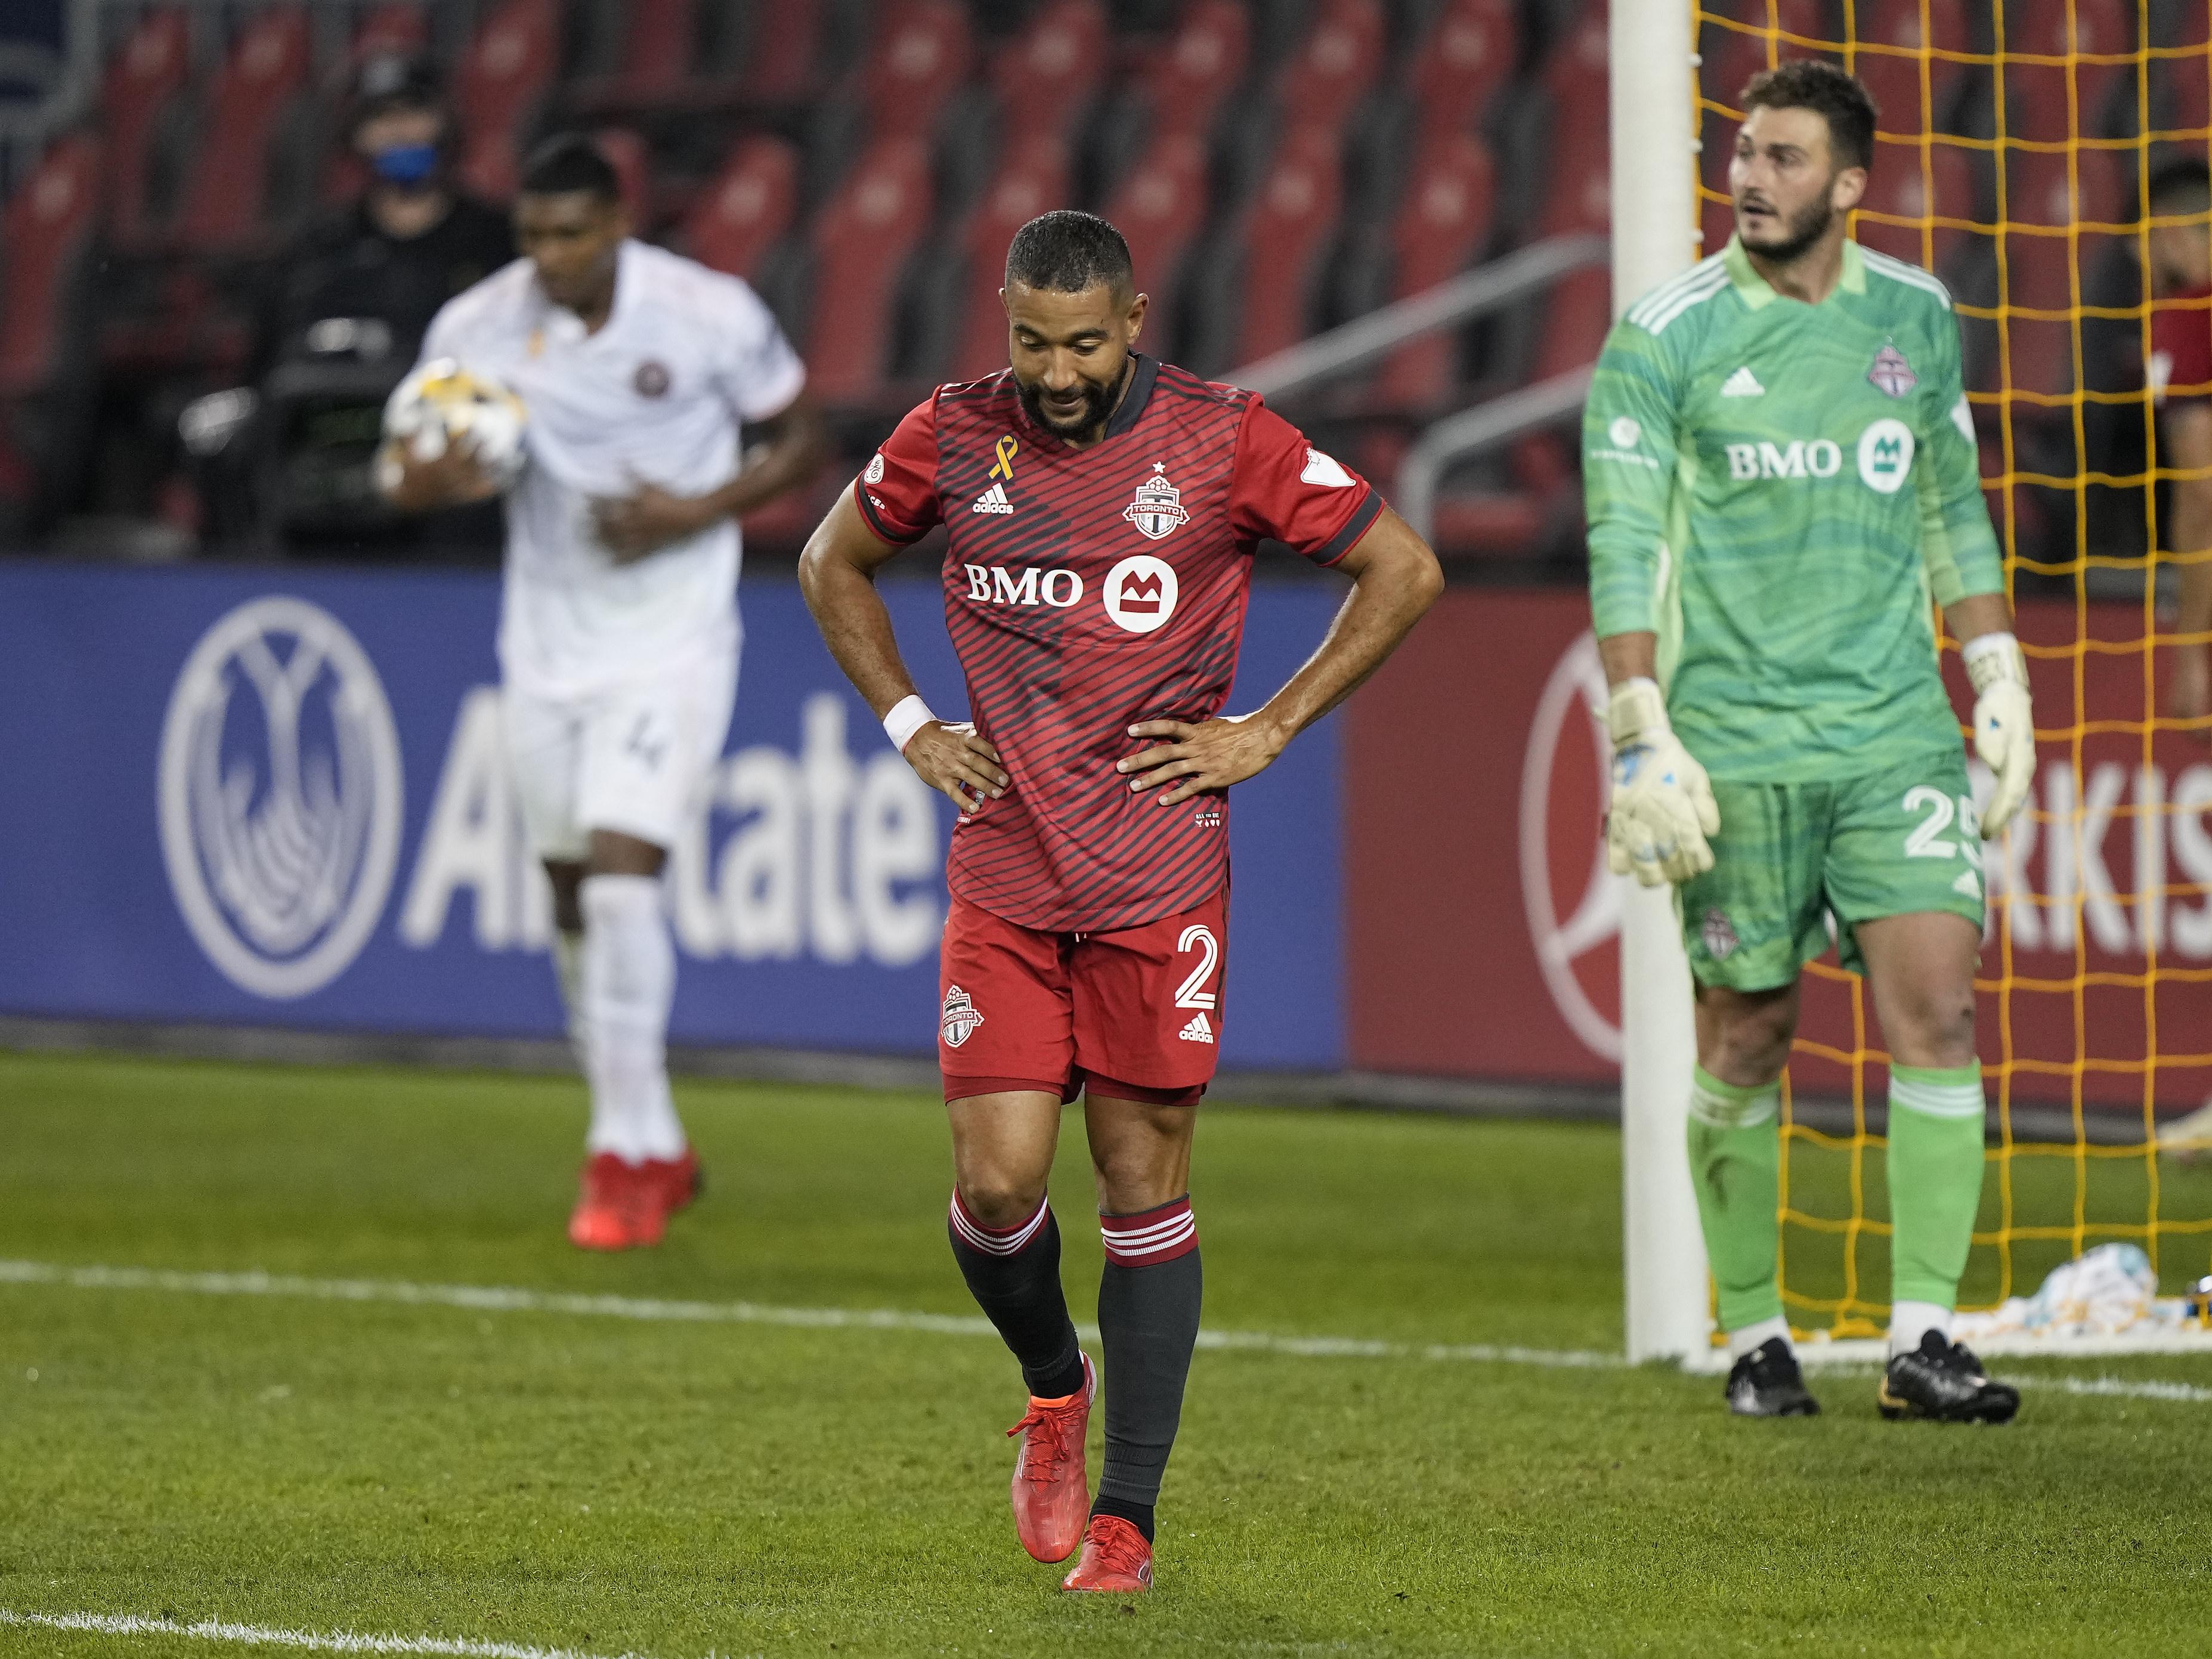 MLS: Inter Miami CF at Toronto FC